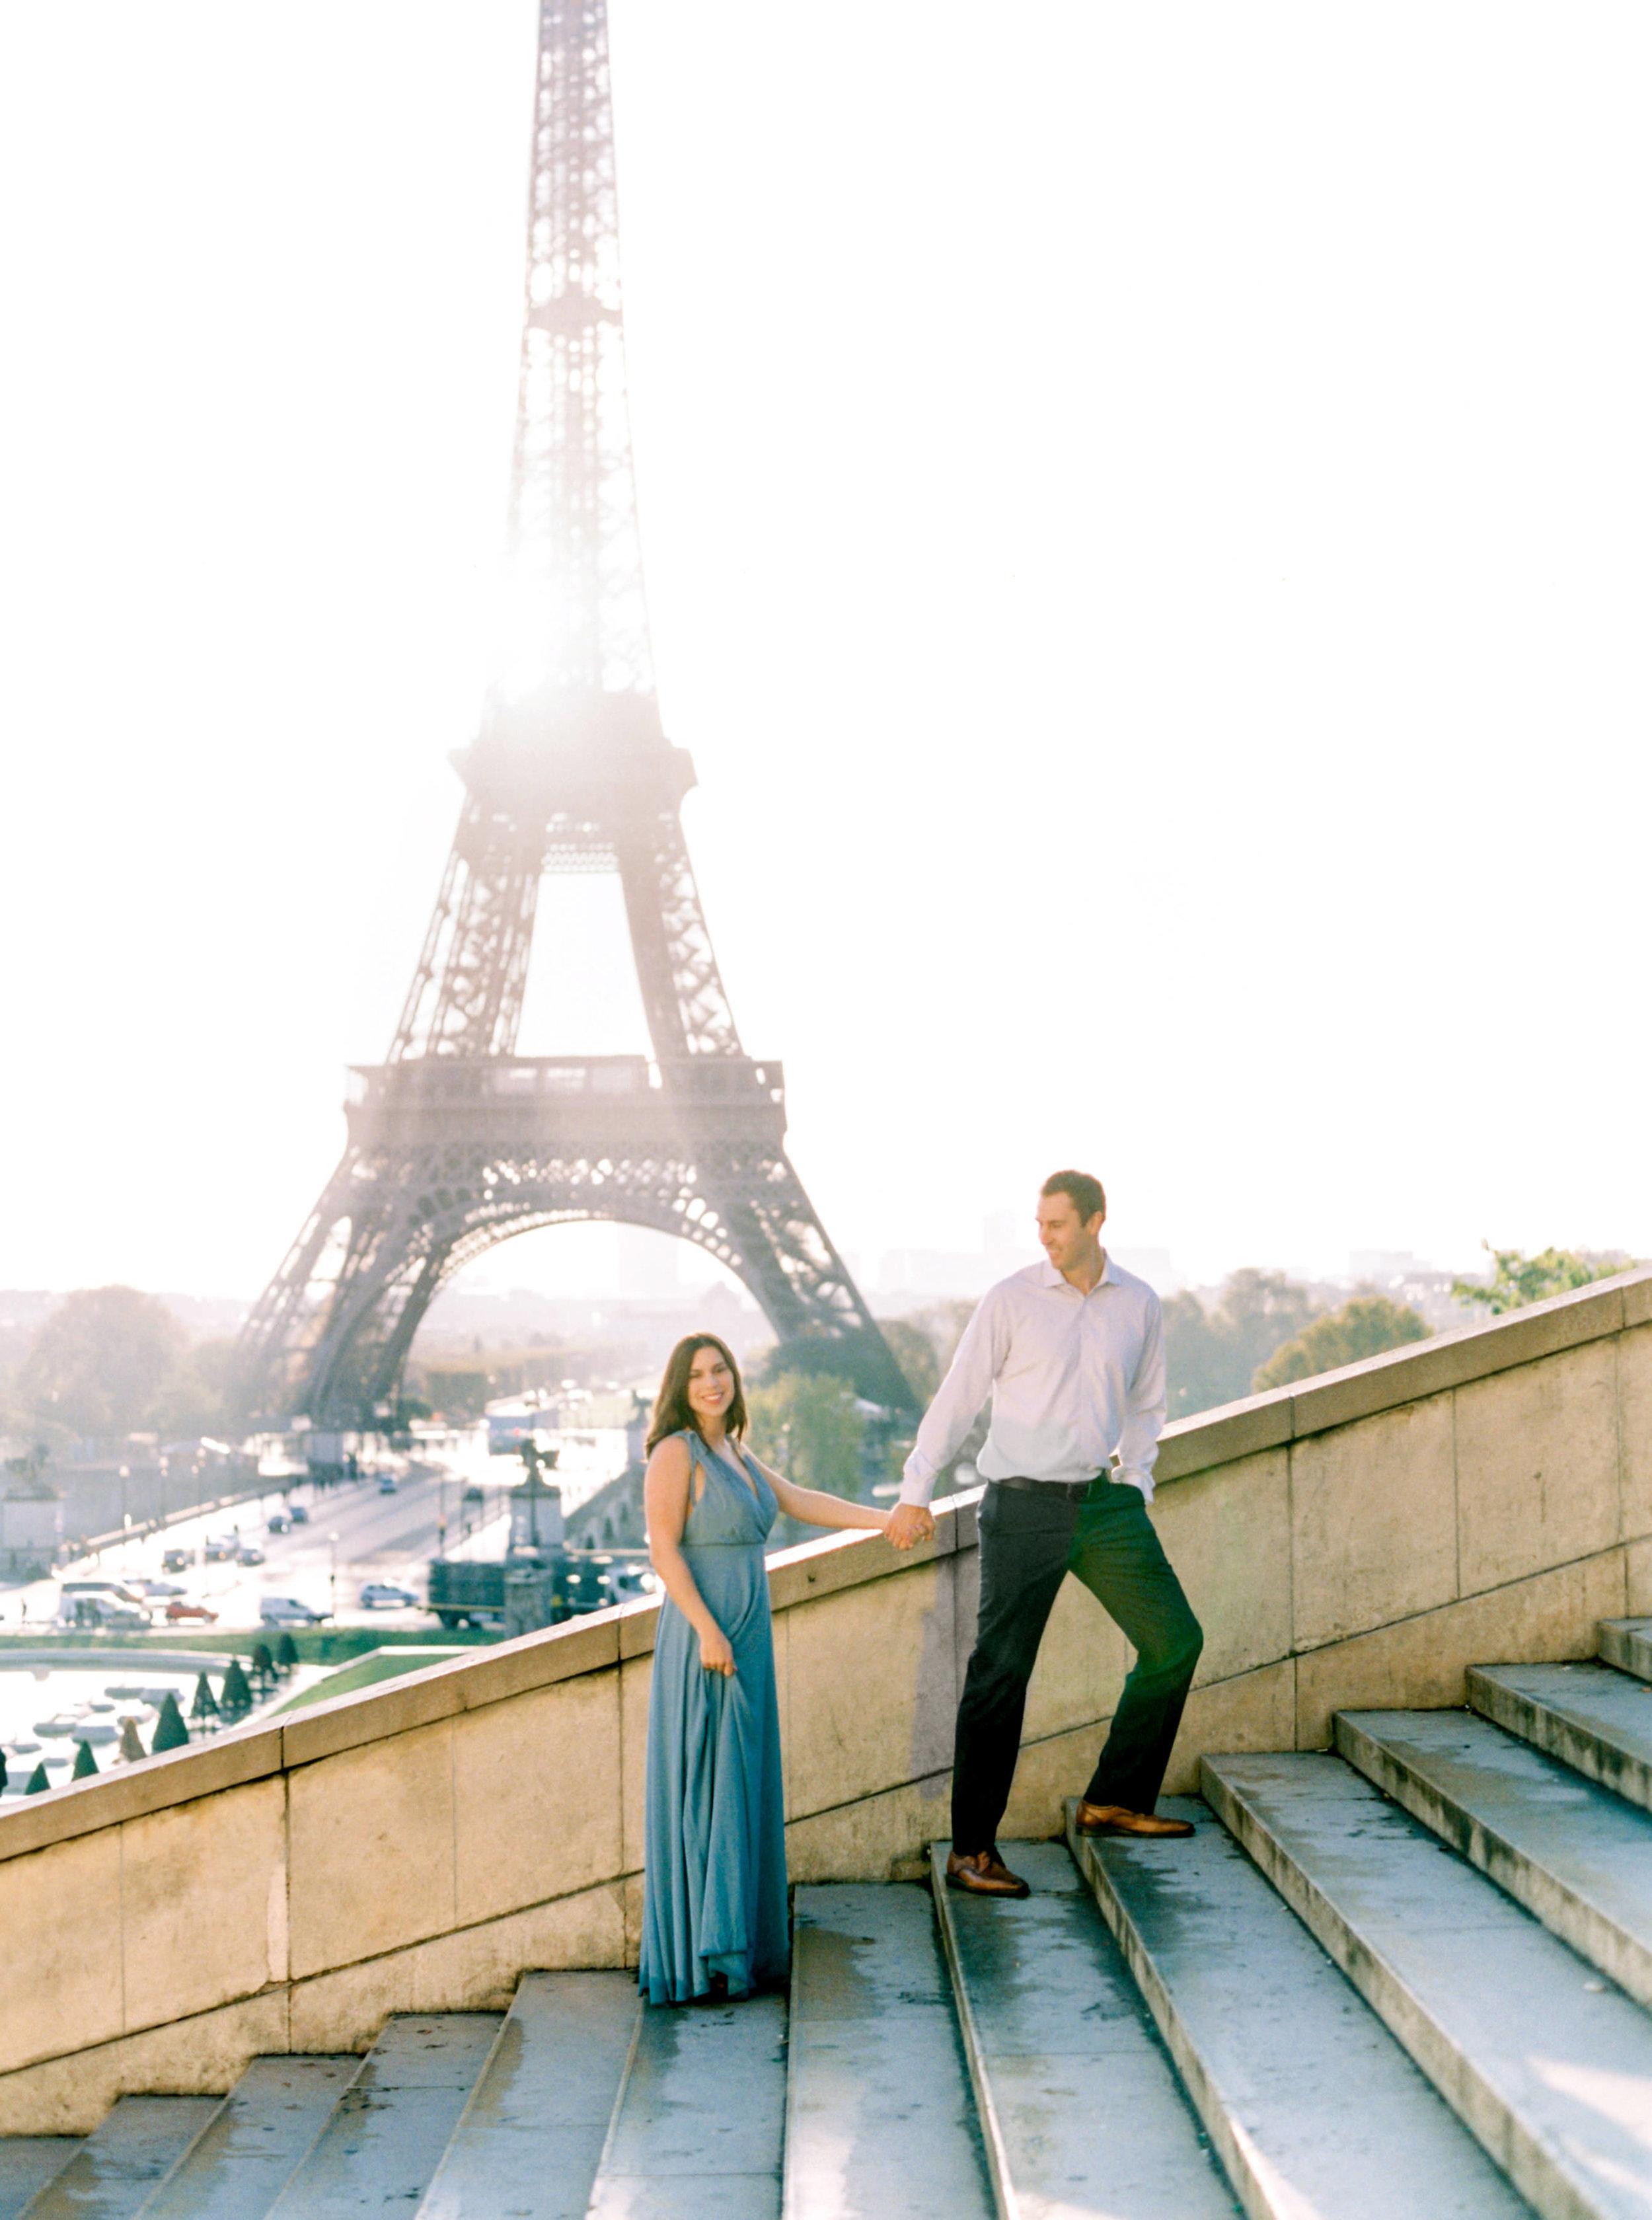 paris-france-wedding-photographer-destination-photographer-3.jpg